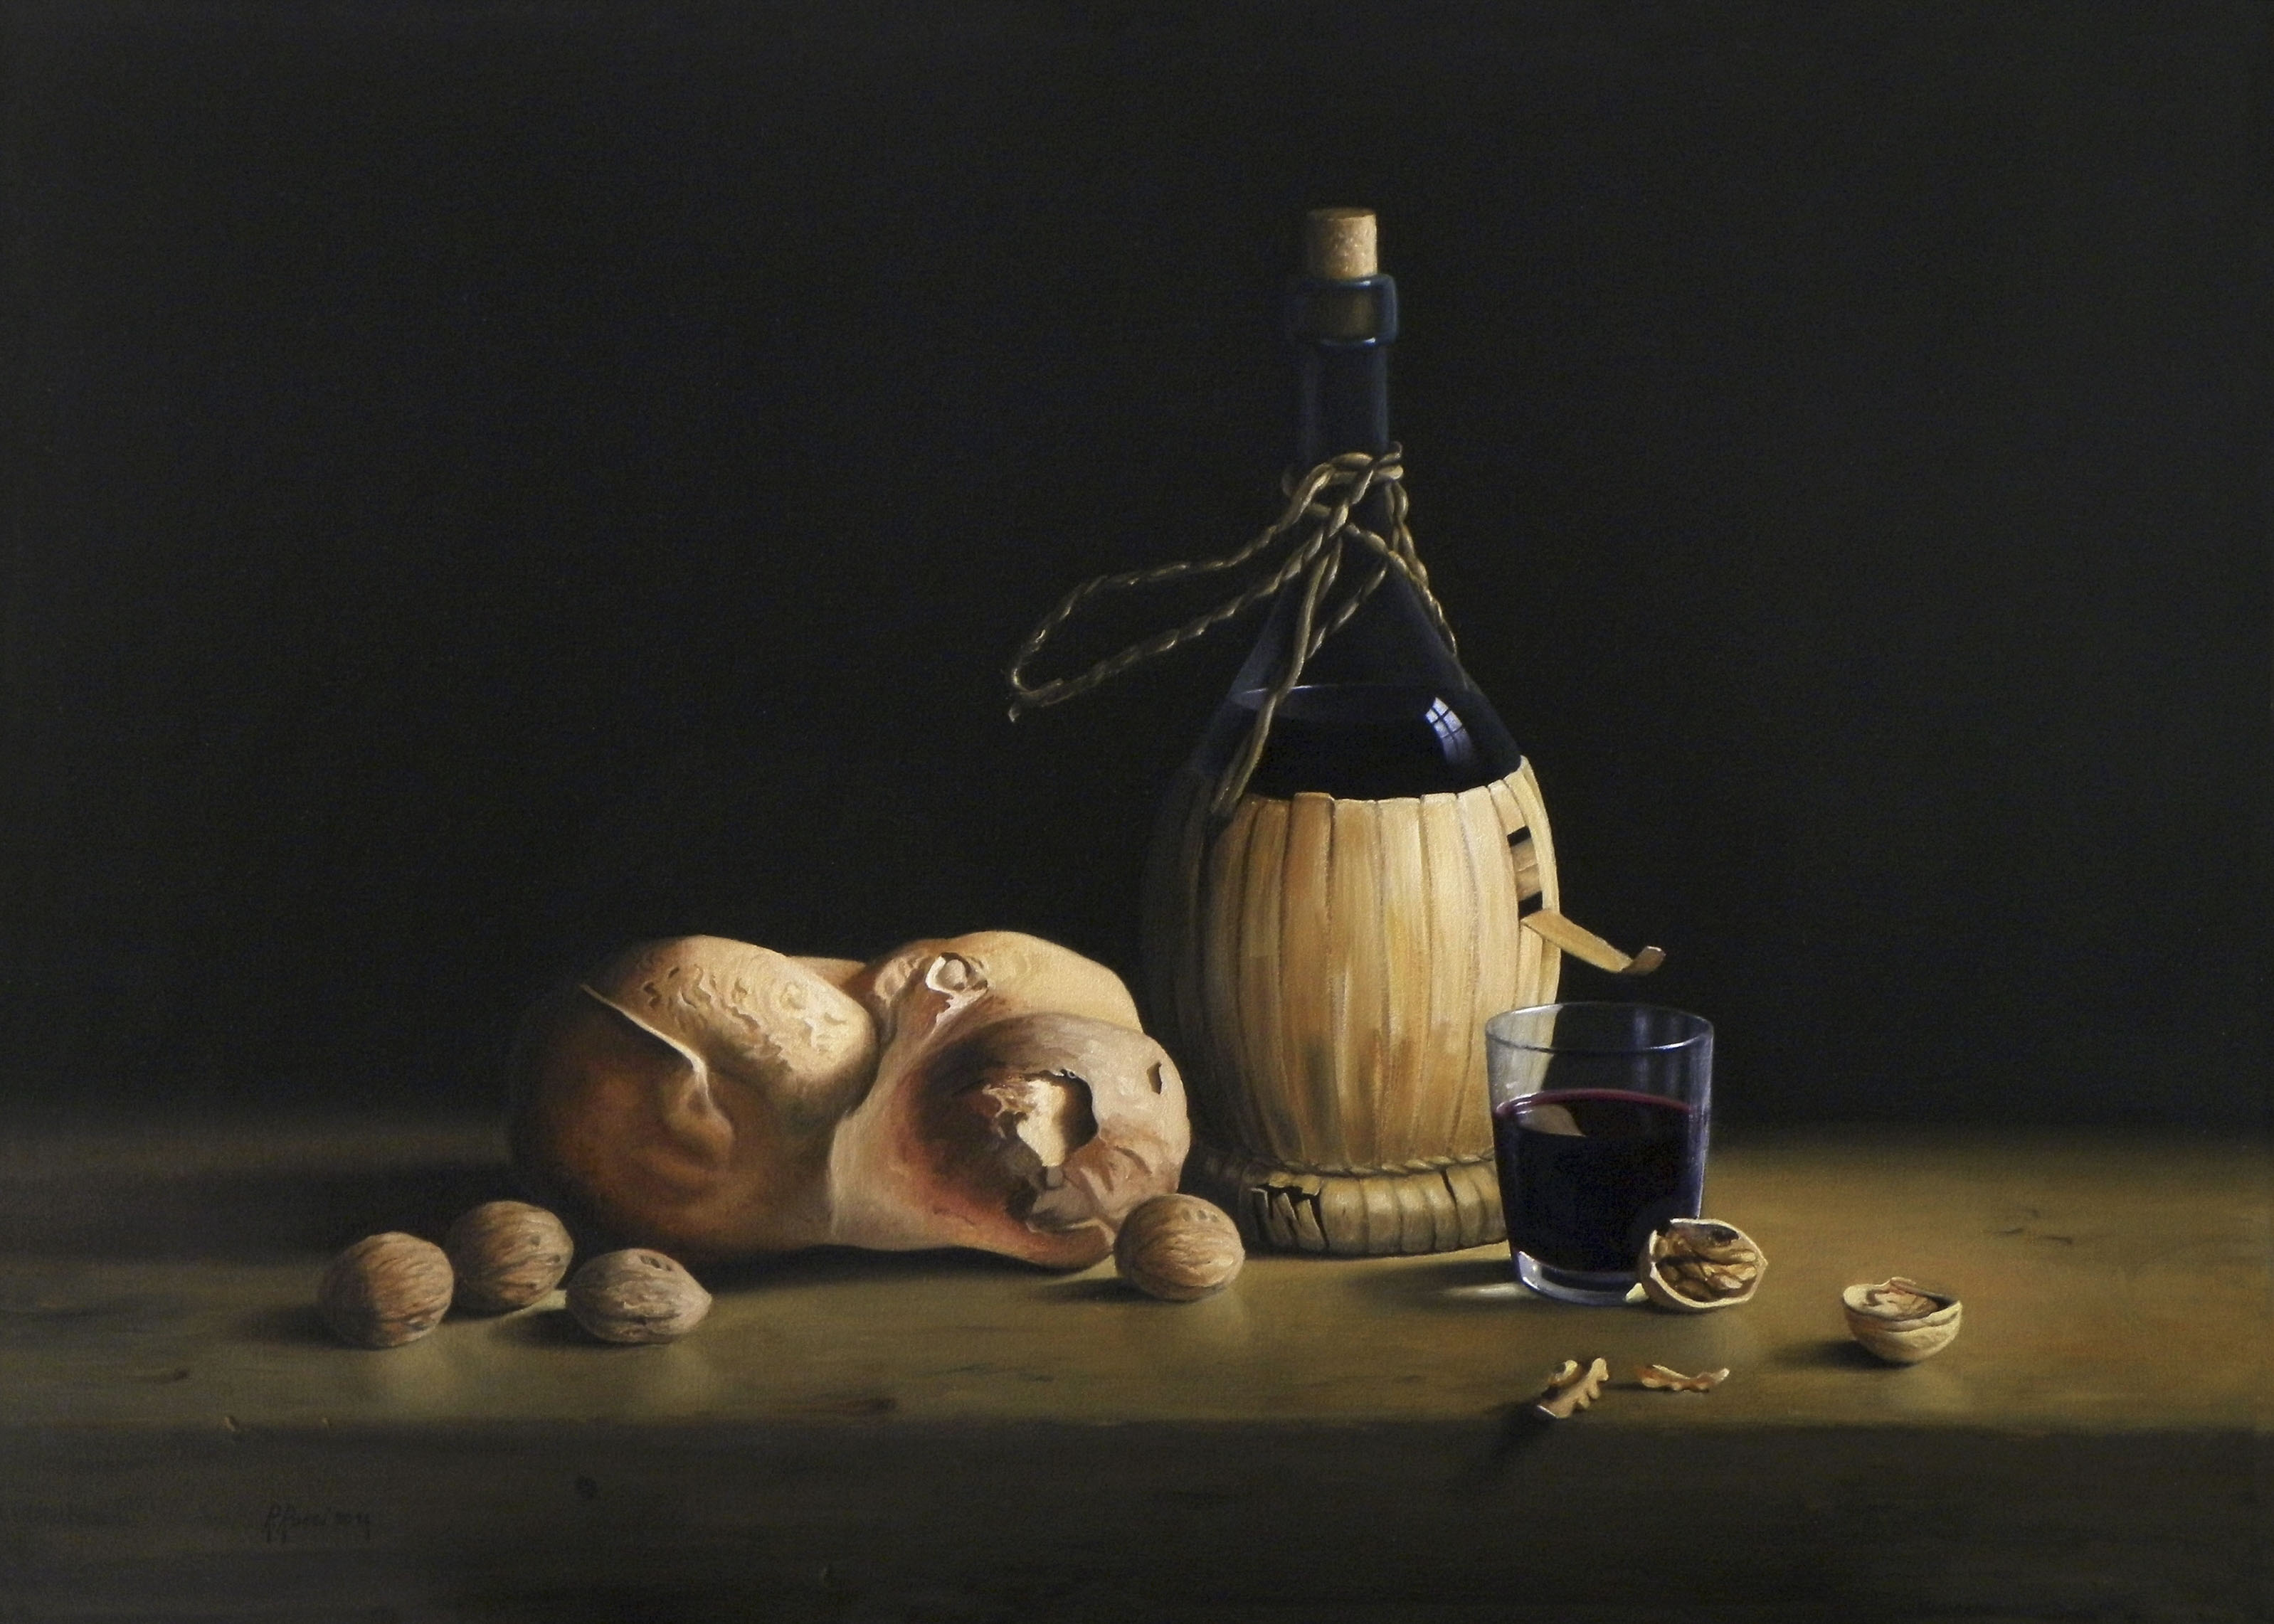 2014 roberta rossi - una lieta merenda - olio su tela - 50 x 70